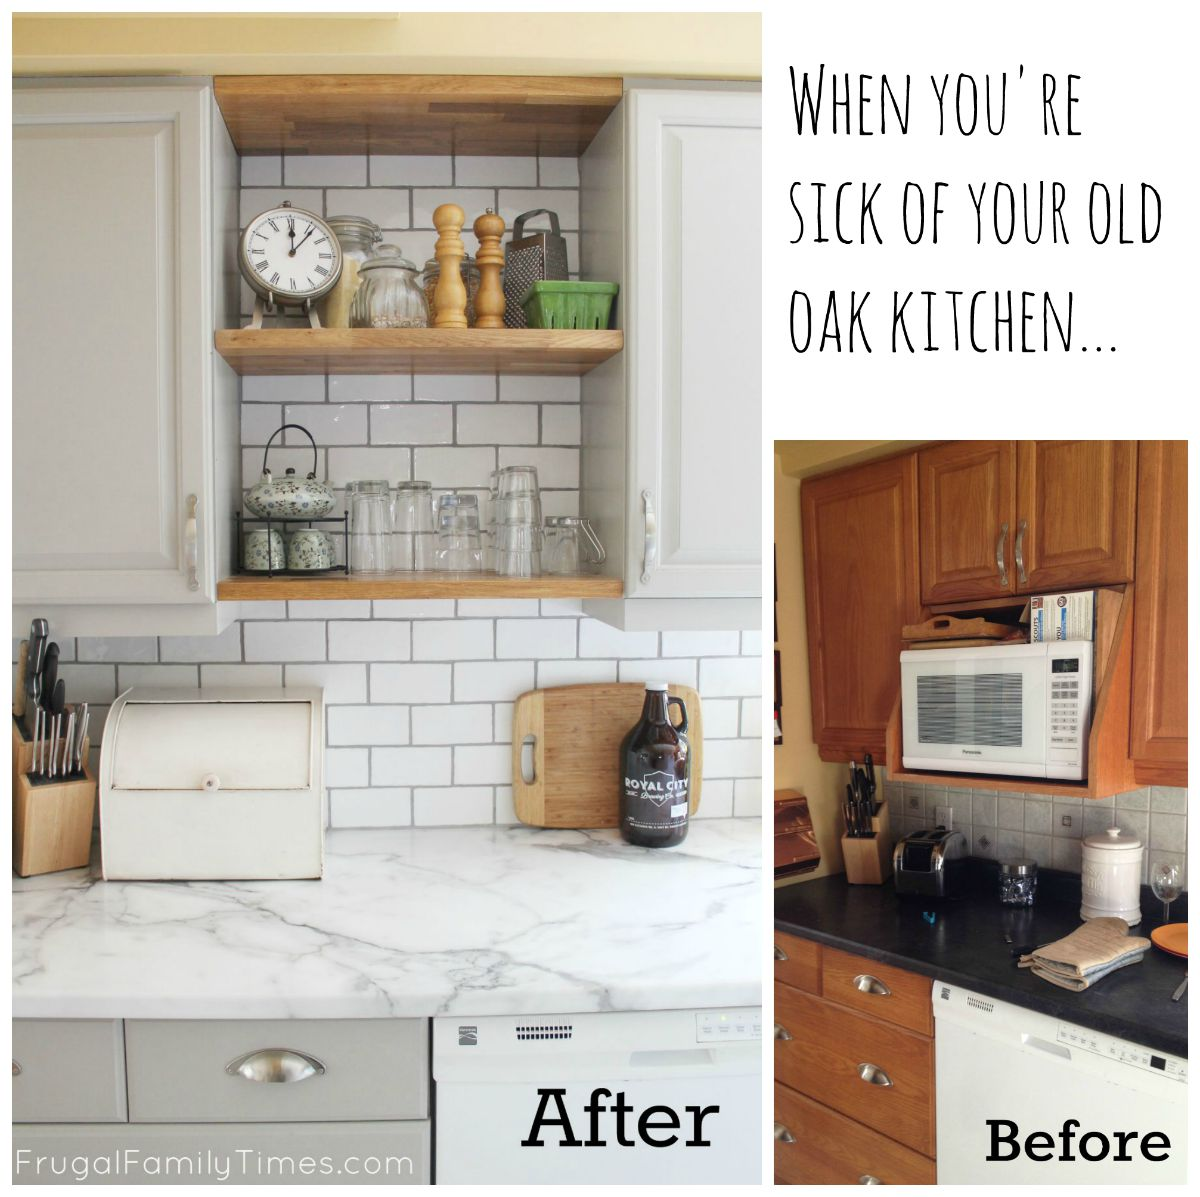 kitchen facelift before and after subway tile backsplash when you 39re sick of your old oak update